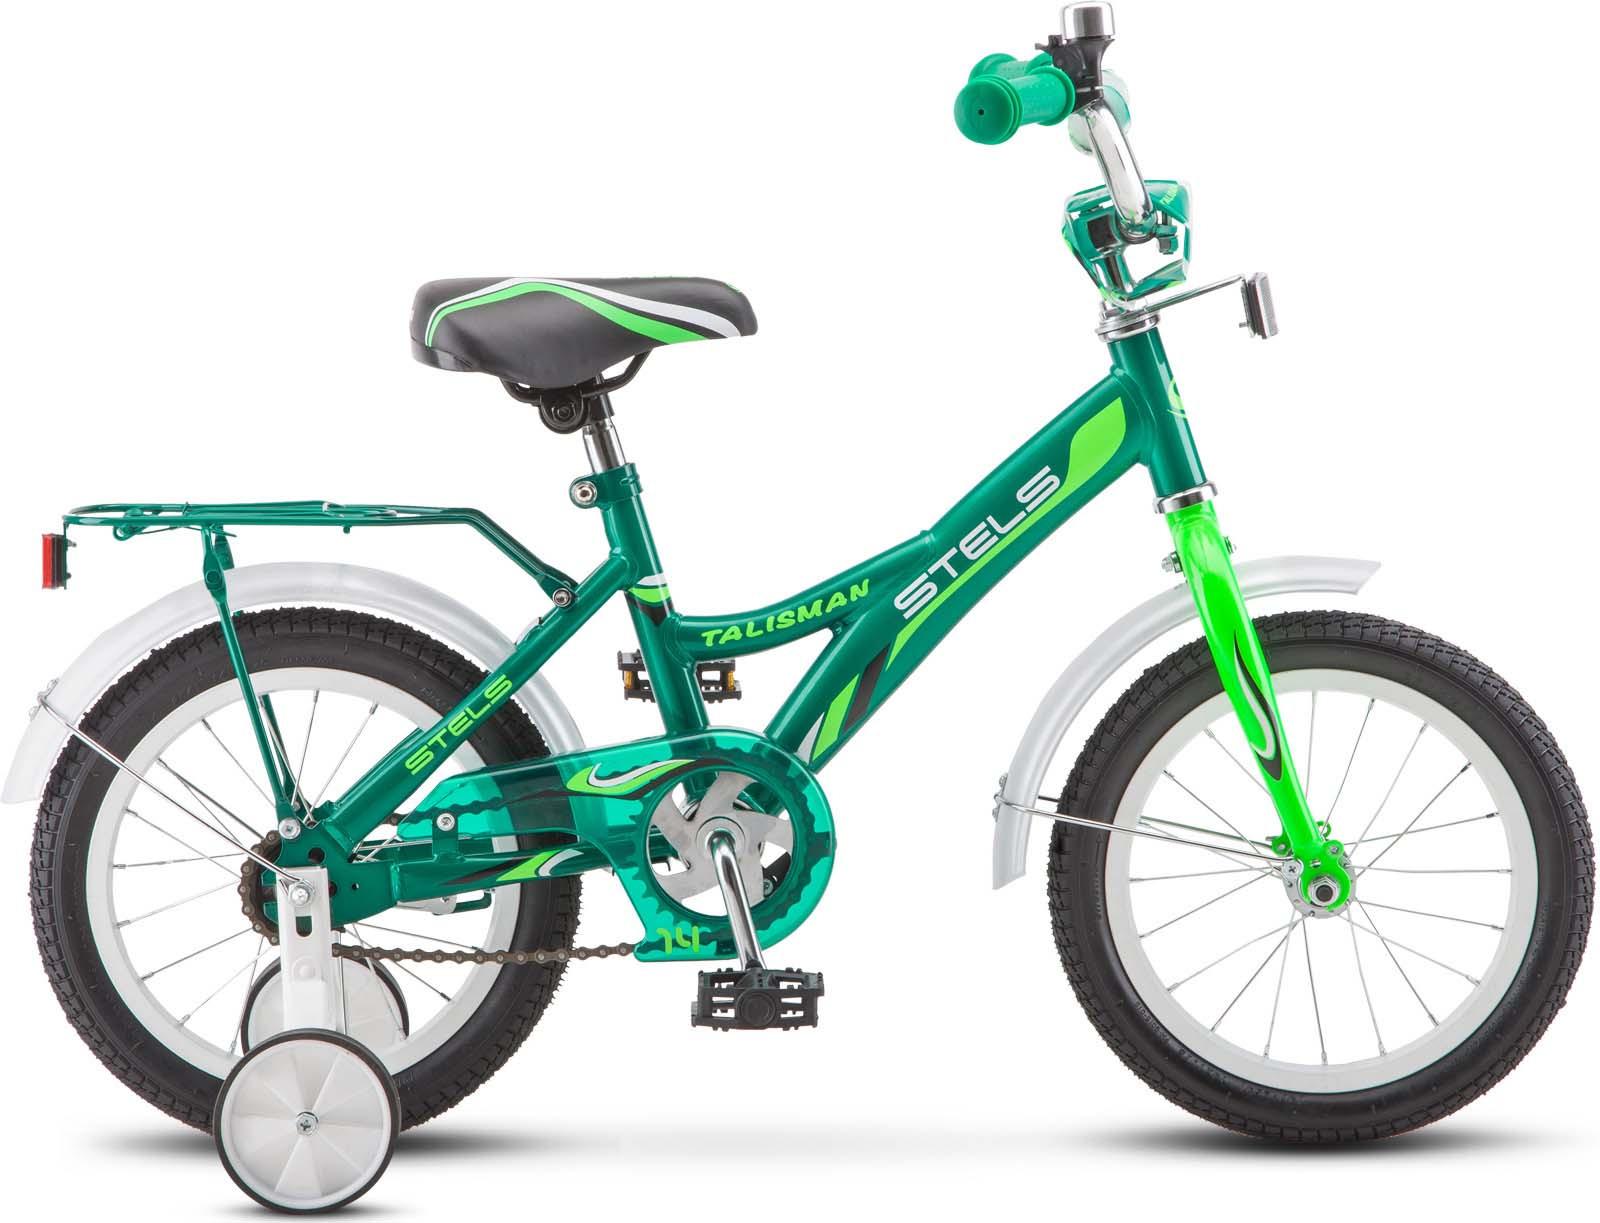 Велосипед Stels Talisman 14, JU000182422018, зеленый